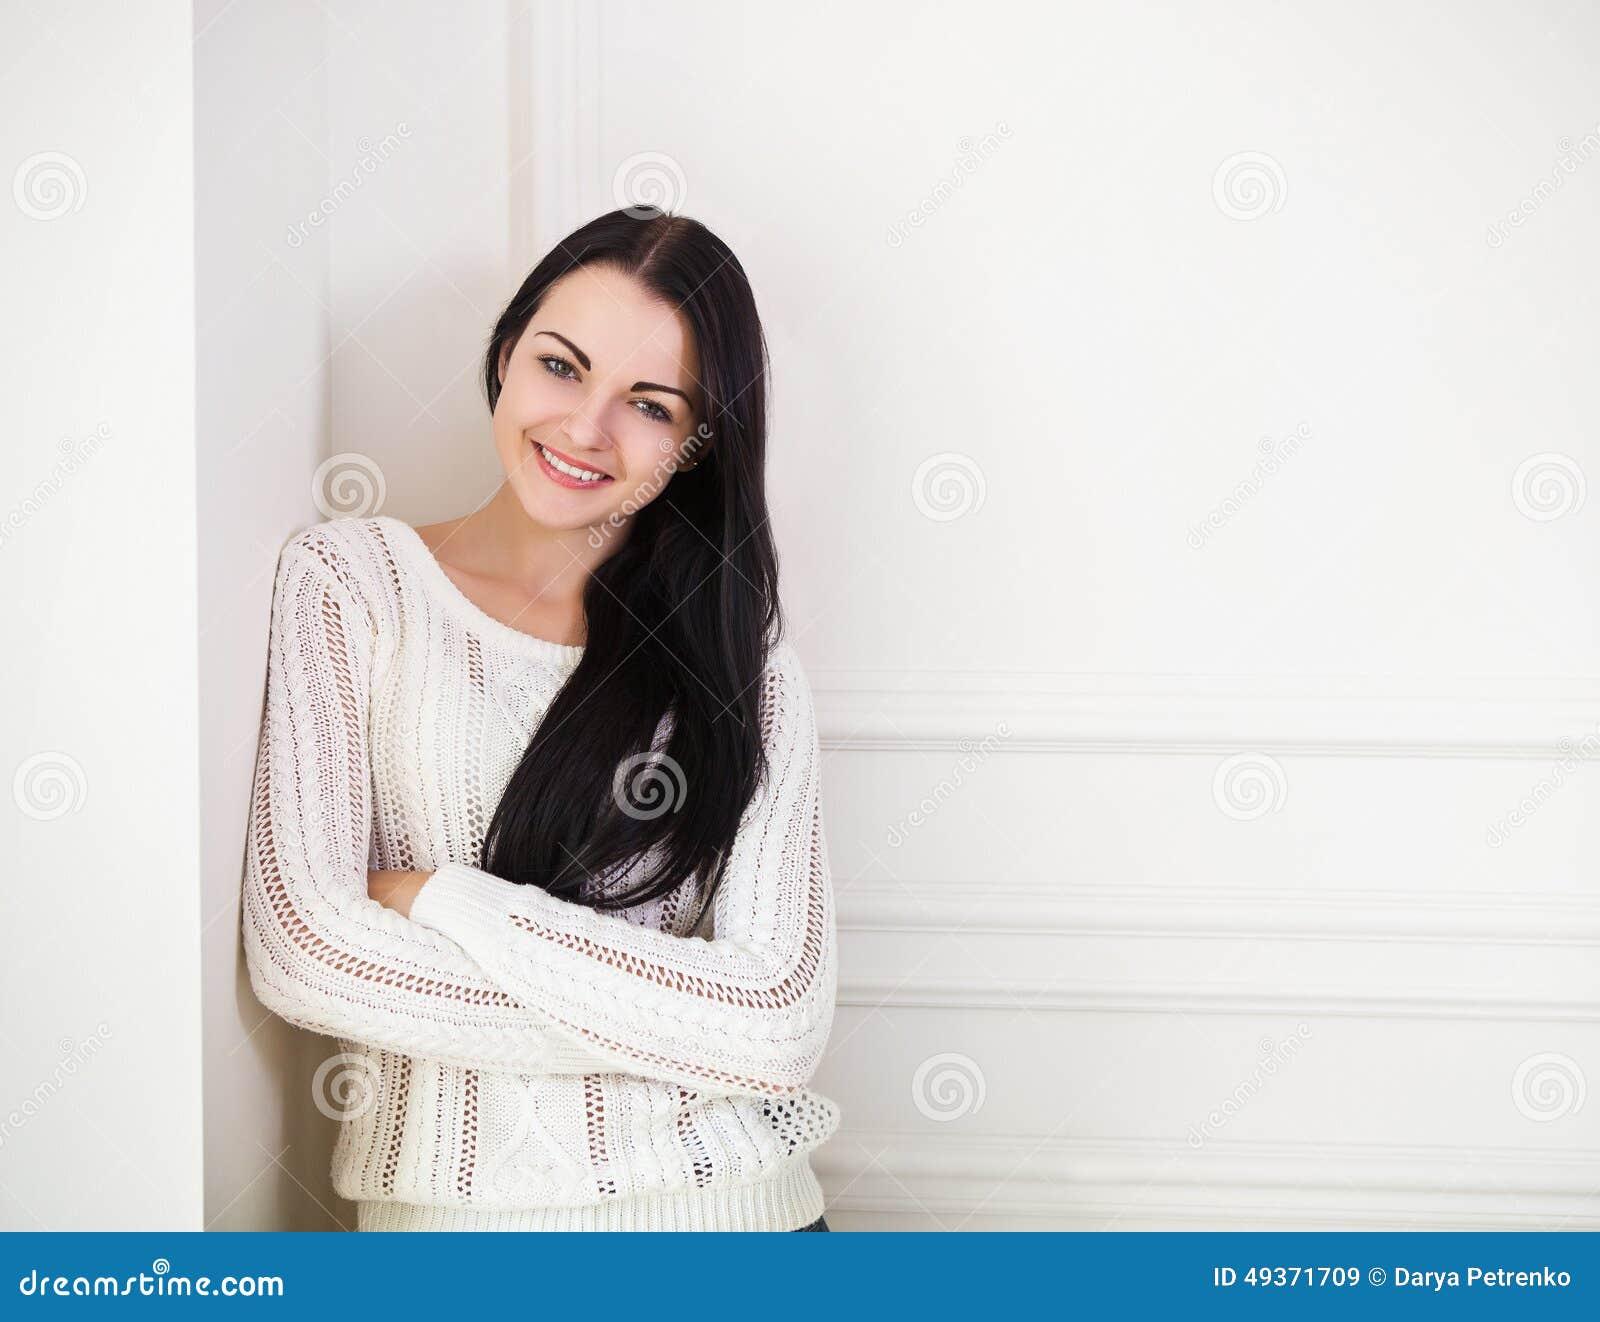 Cute brunette teen